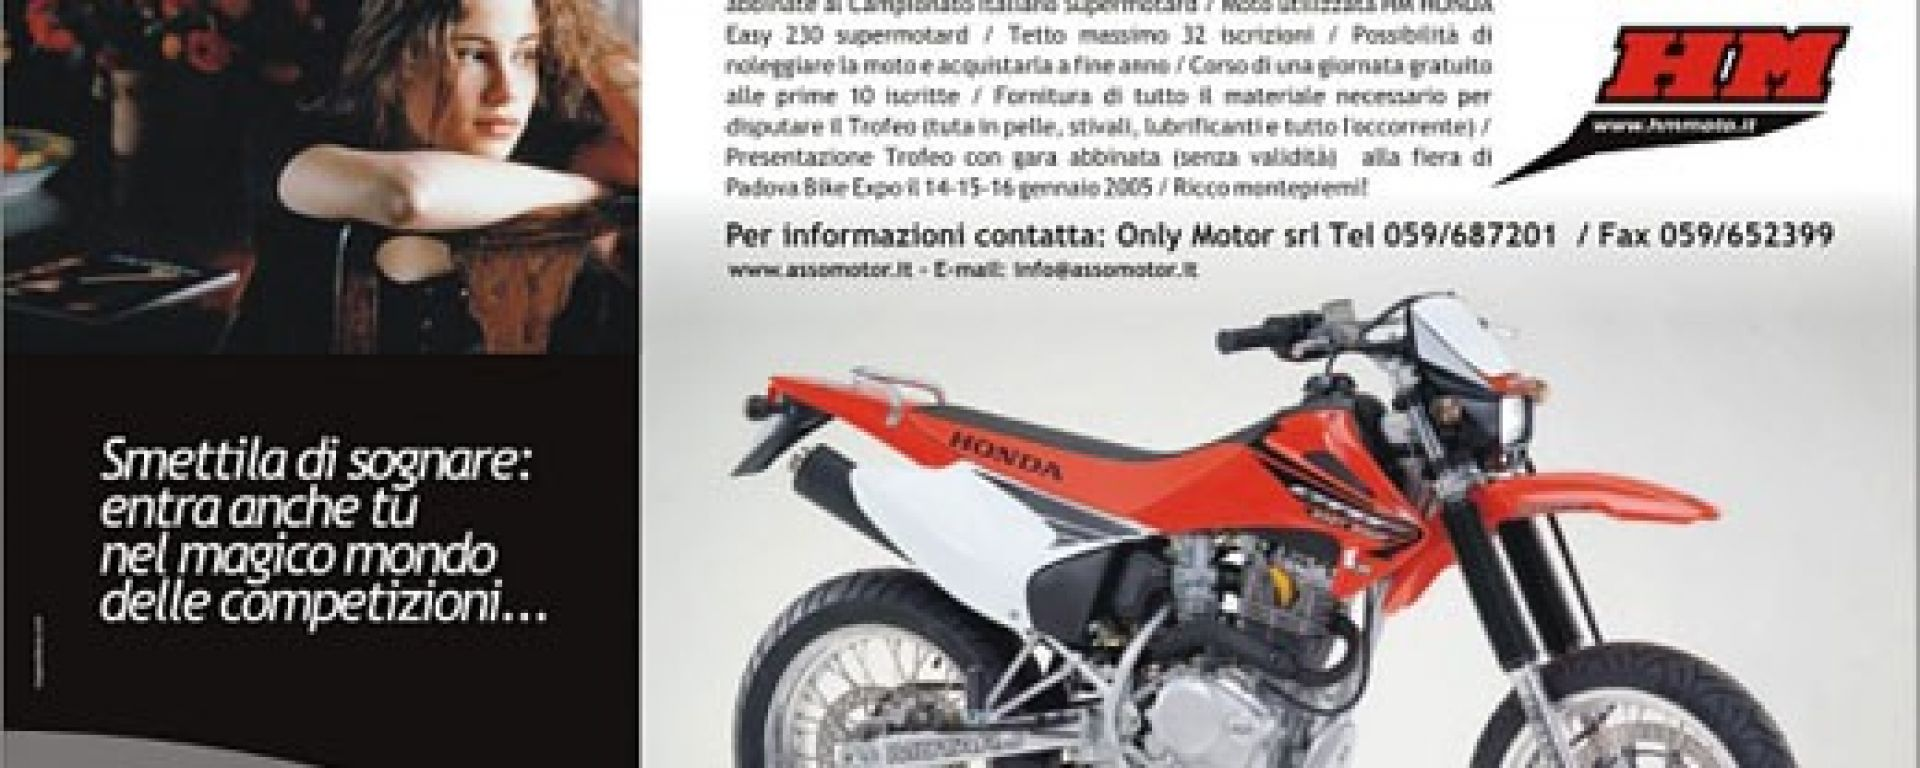 HONDA-HM: arriva il motard al femminile